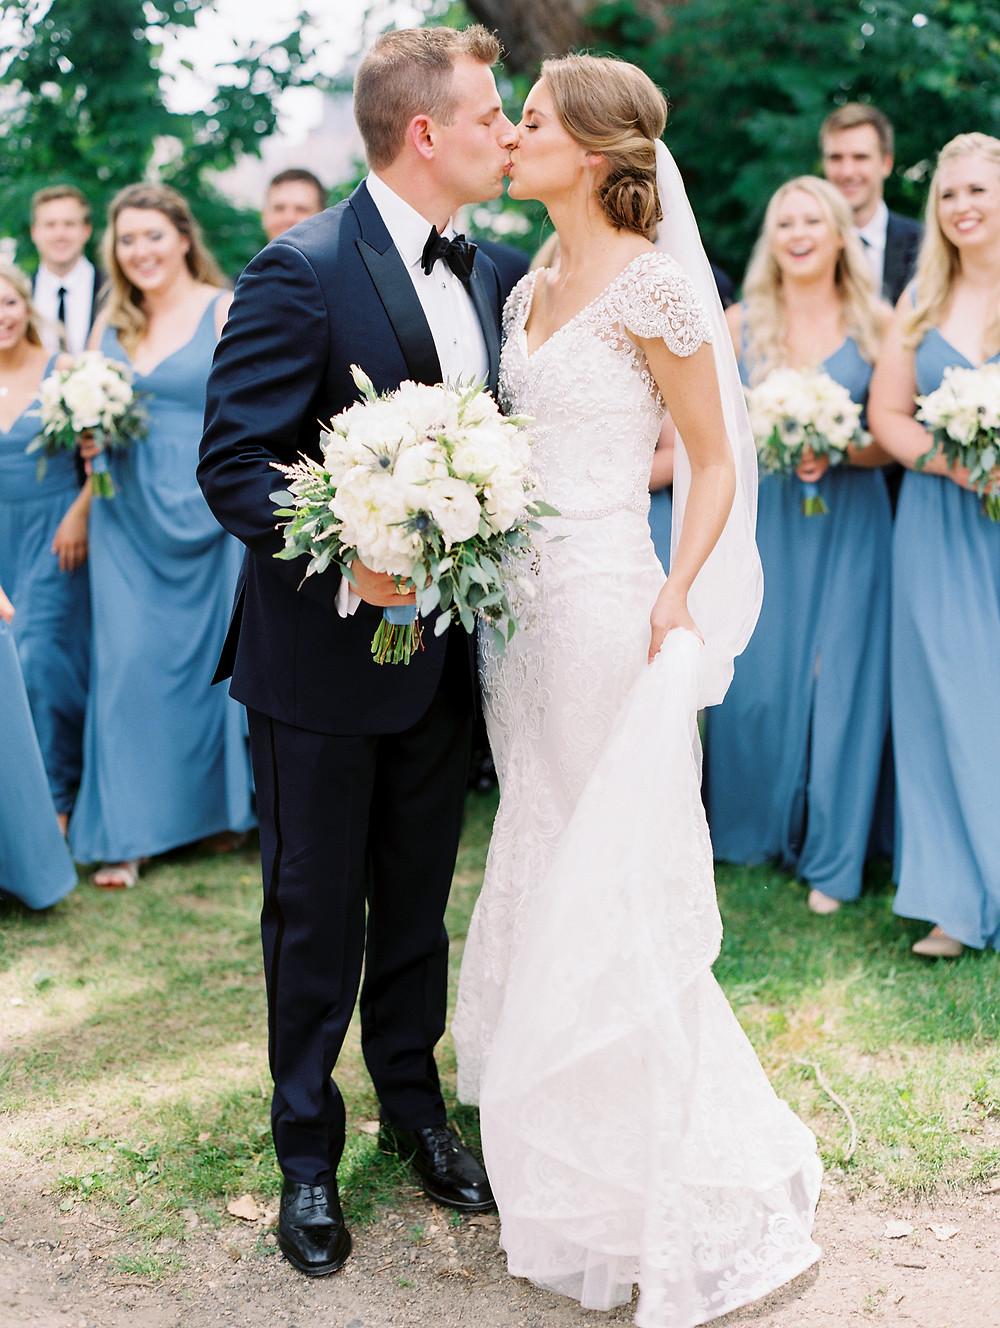 Something Blue Minneapolis Wedding At Machine Shop Mpls S J,Second Wedding Wedding Dress Mature Bride